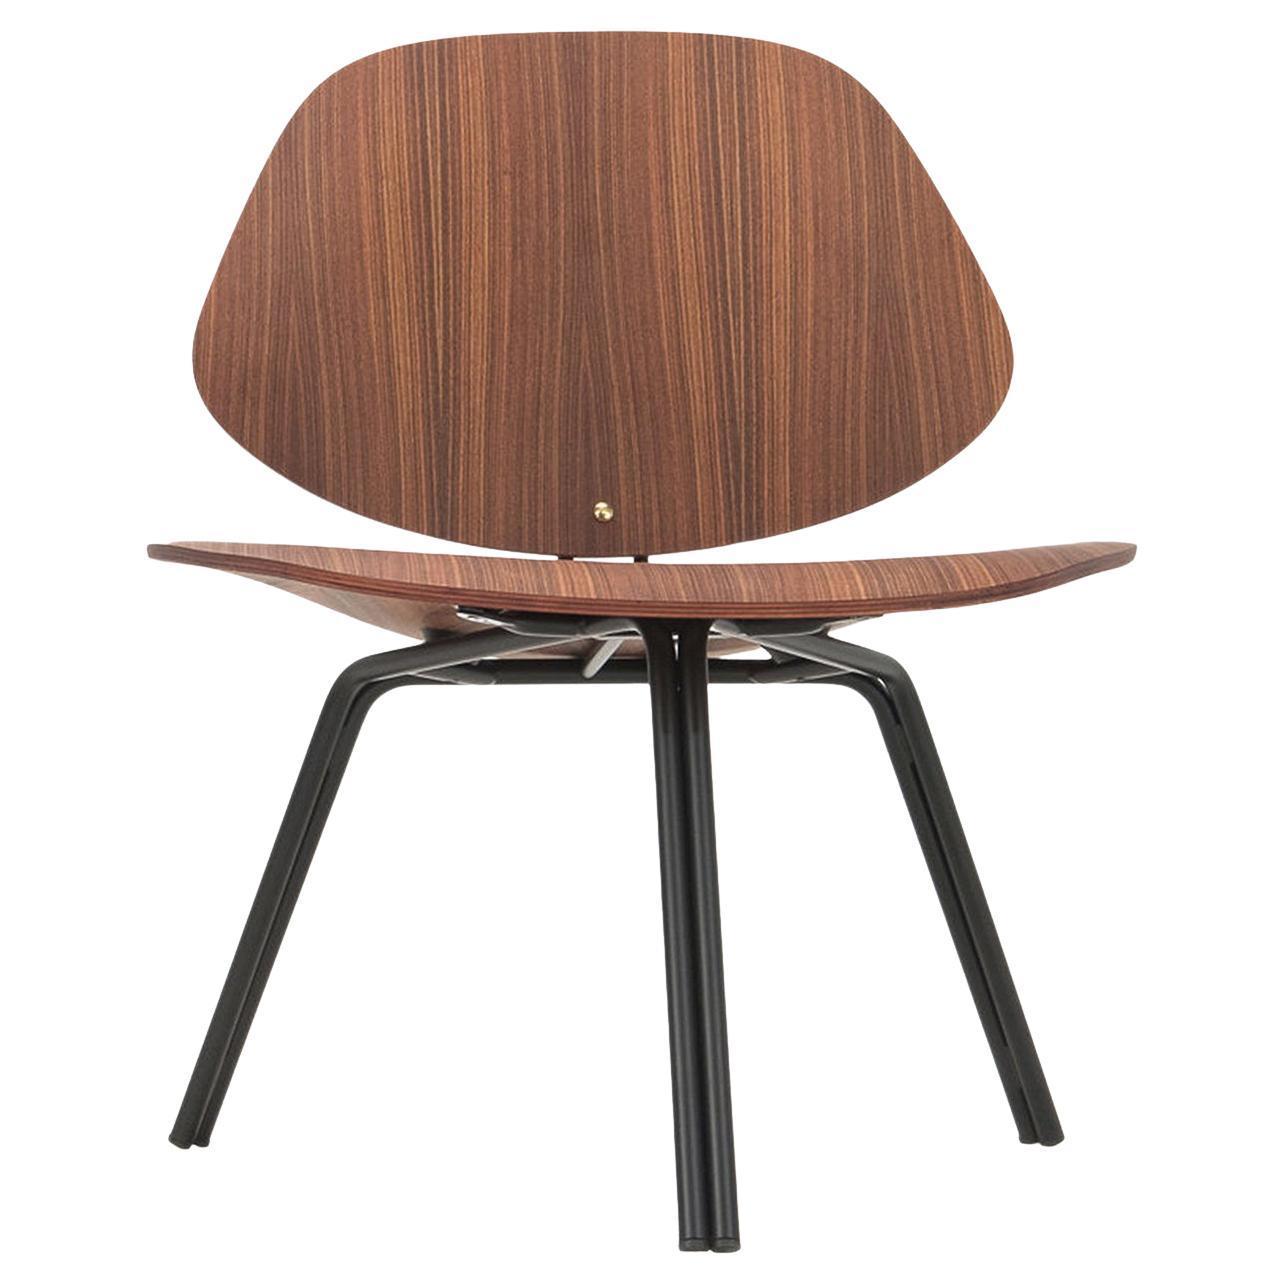 P31 Chair by Osvaldo Borsani